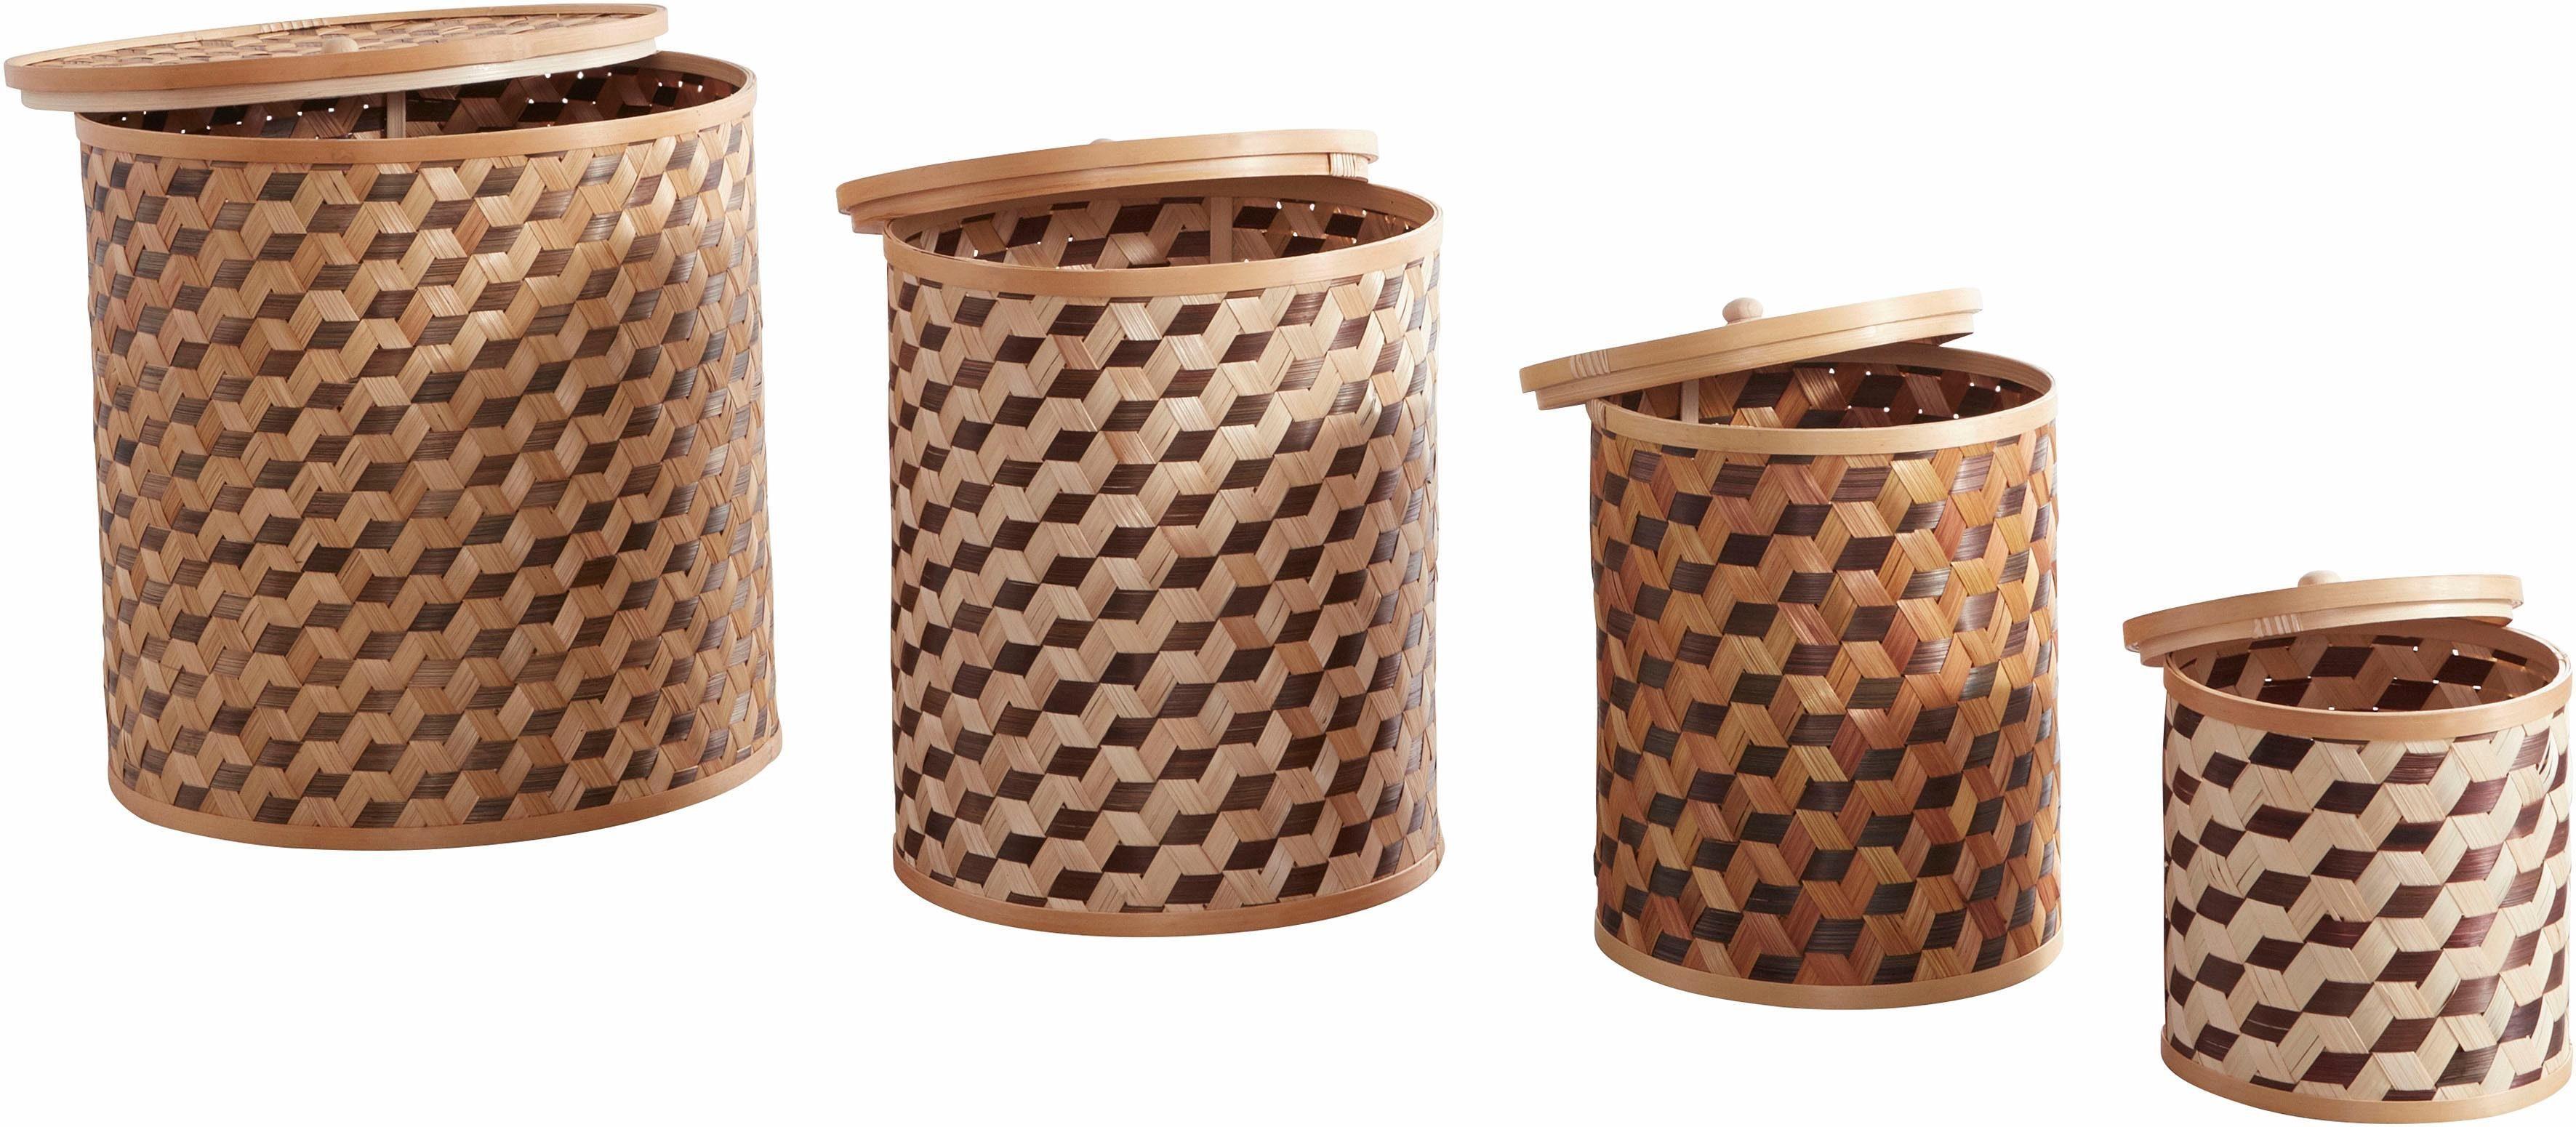 Home affaire Boxen-Set, 4-teilig, mit Deckel